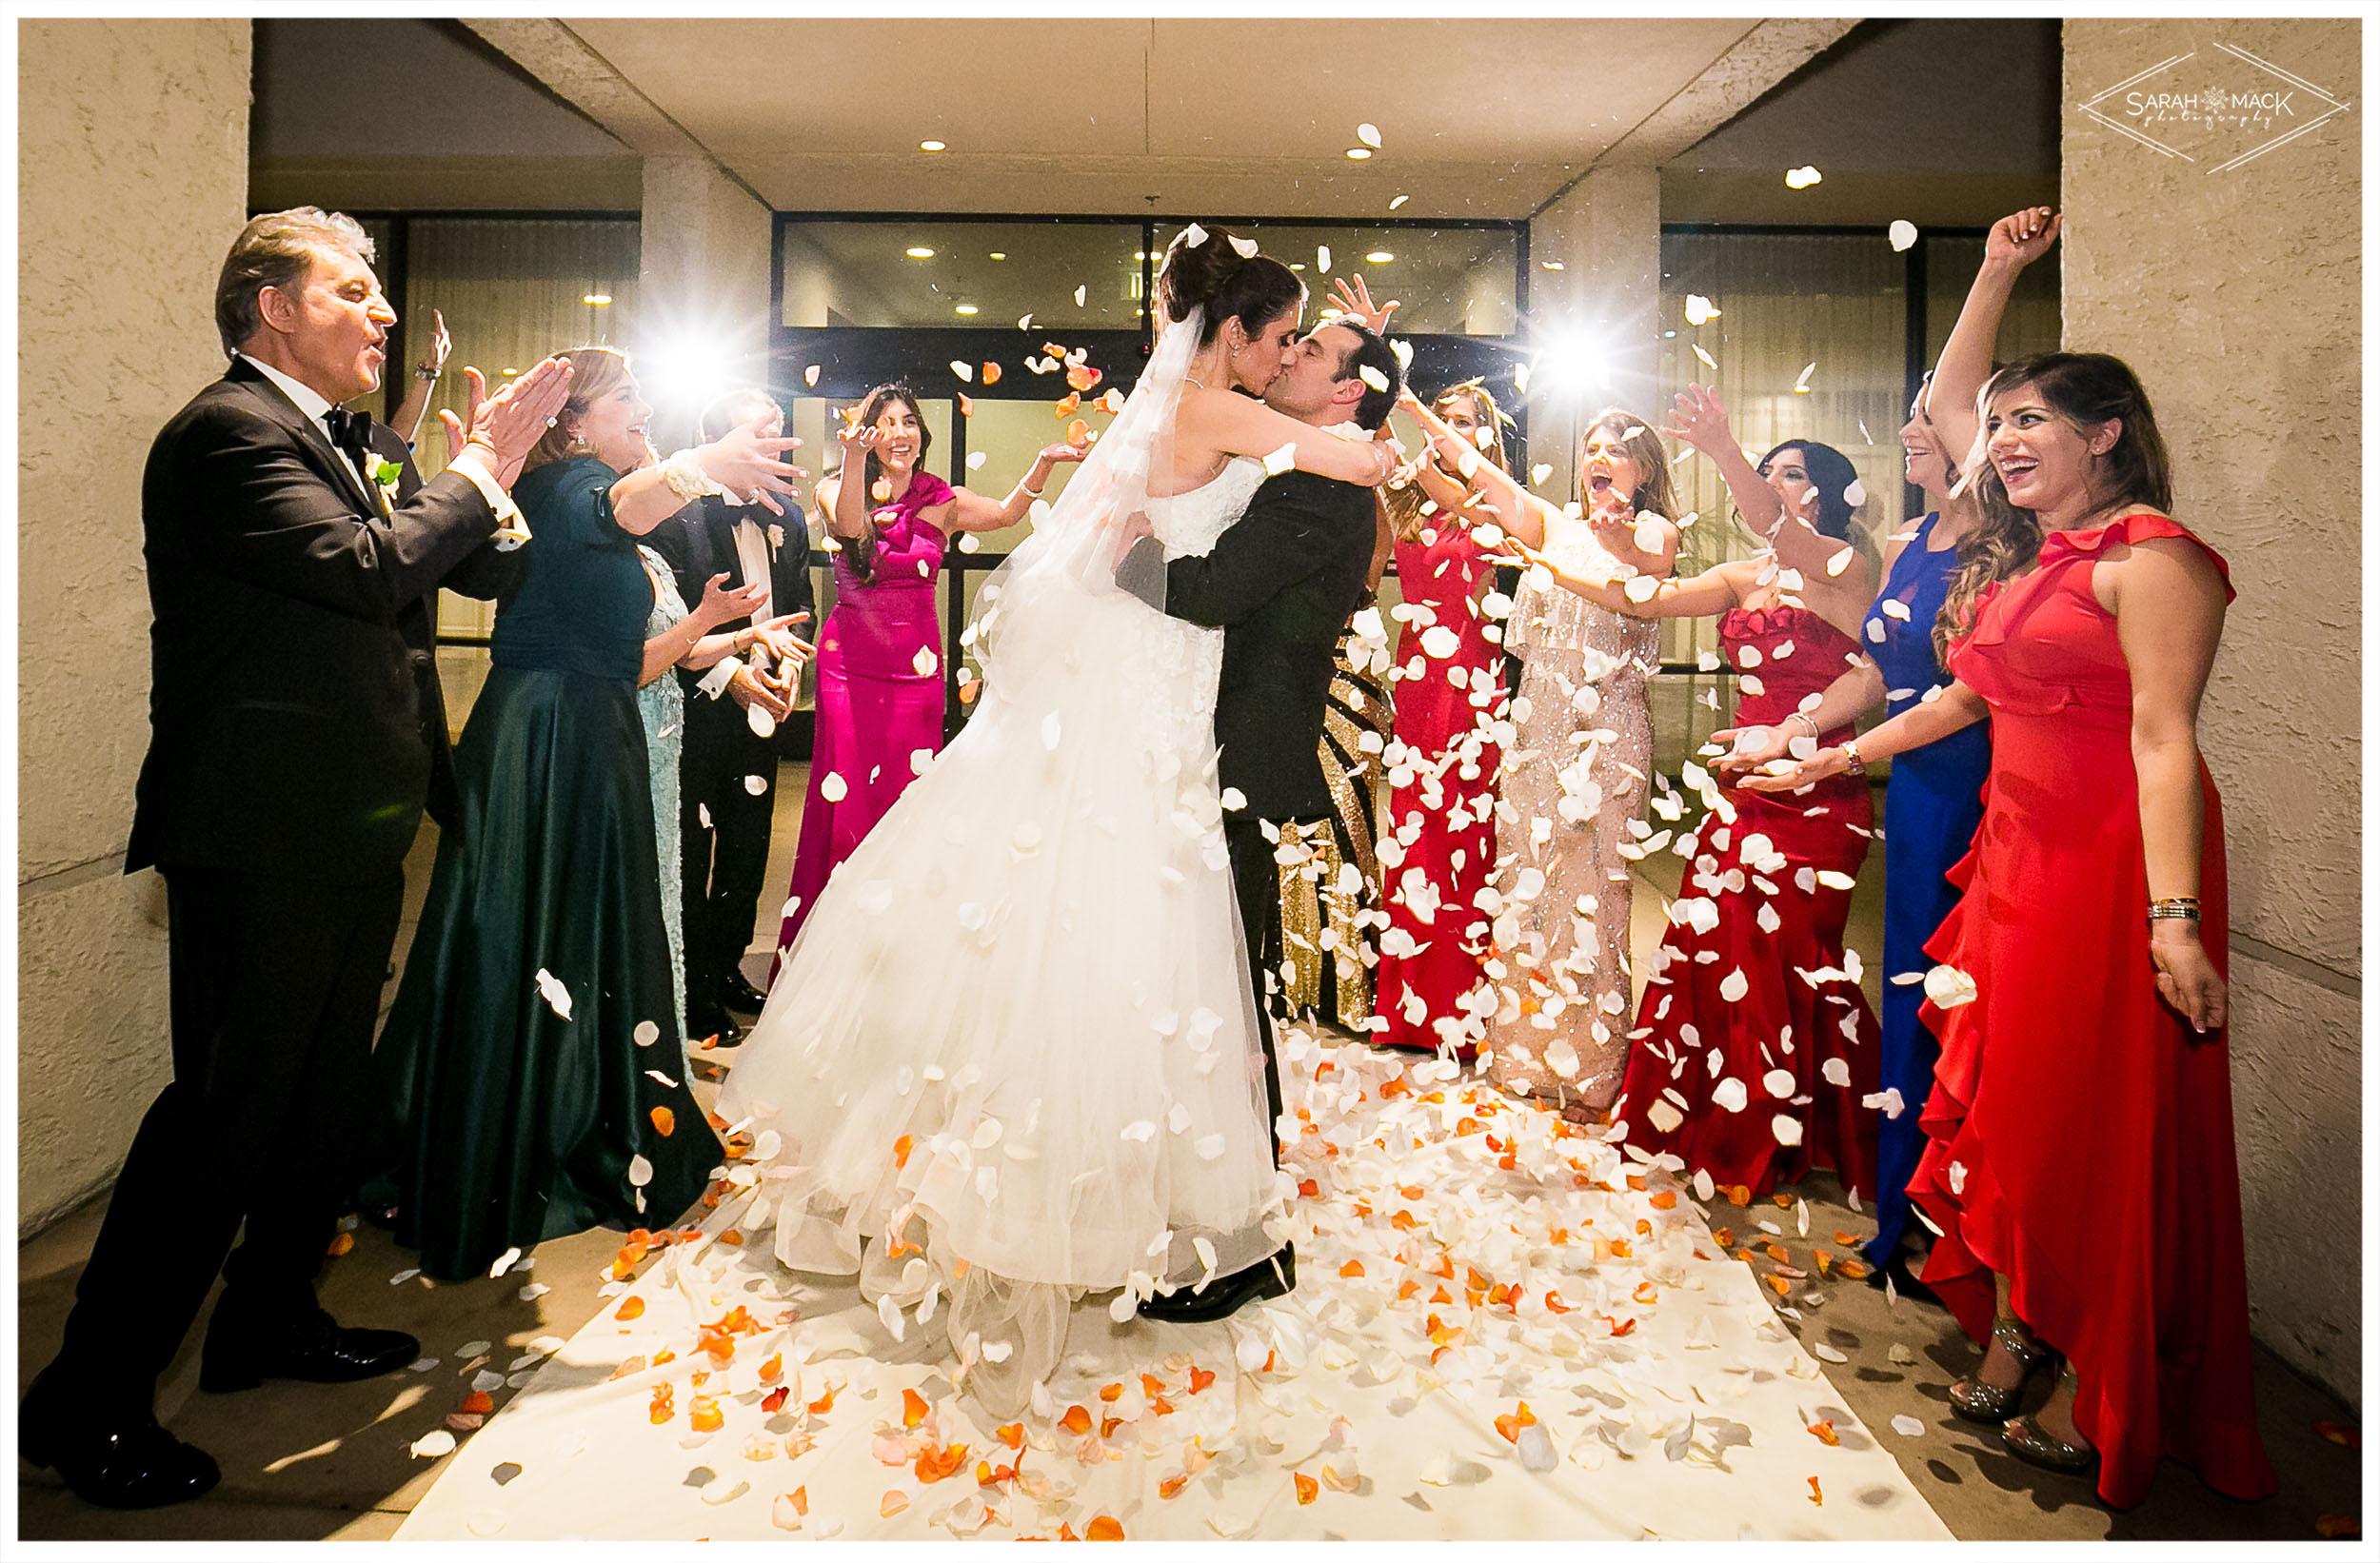 NJ-Newport-Beach-Marriott-Persian-Wedding-46.jpg